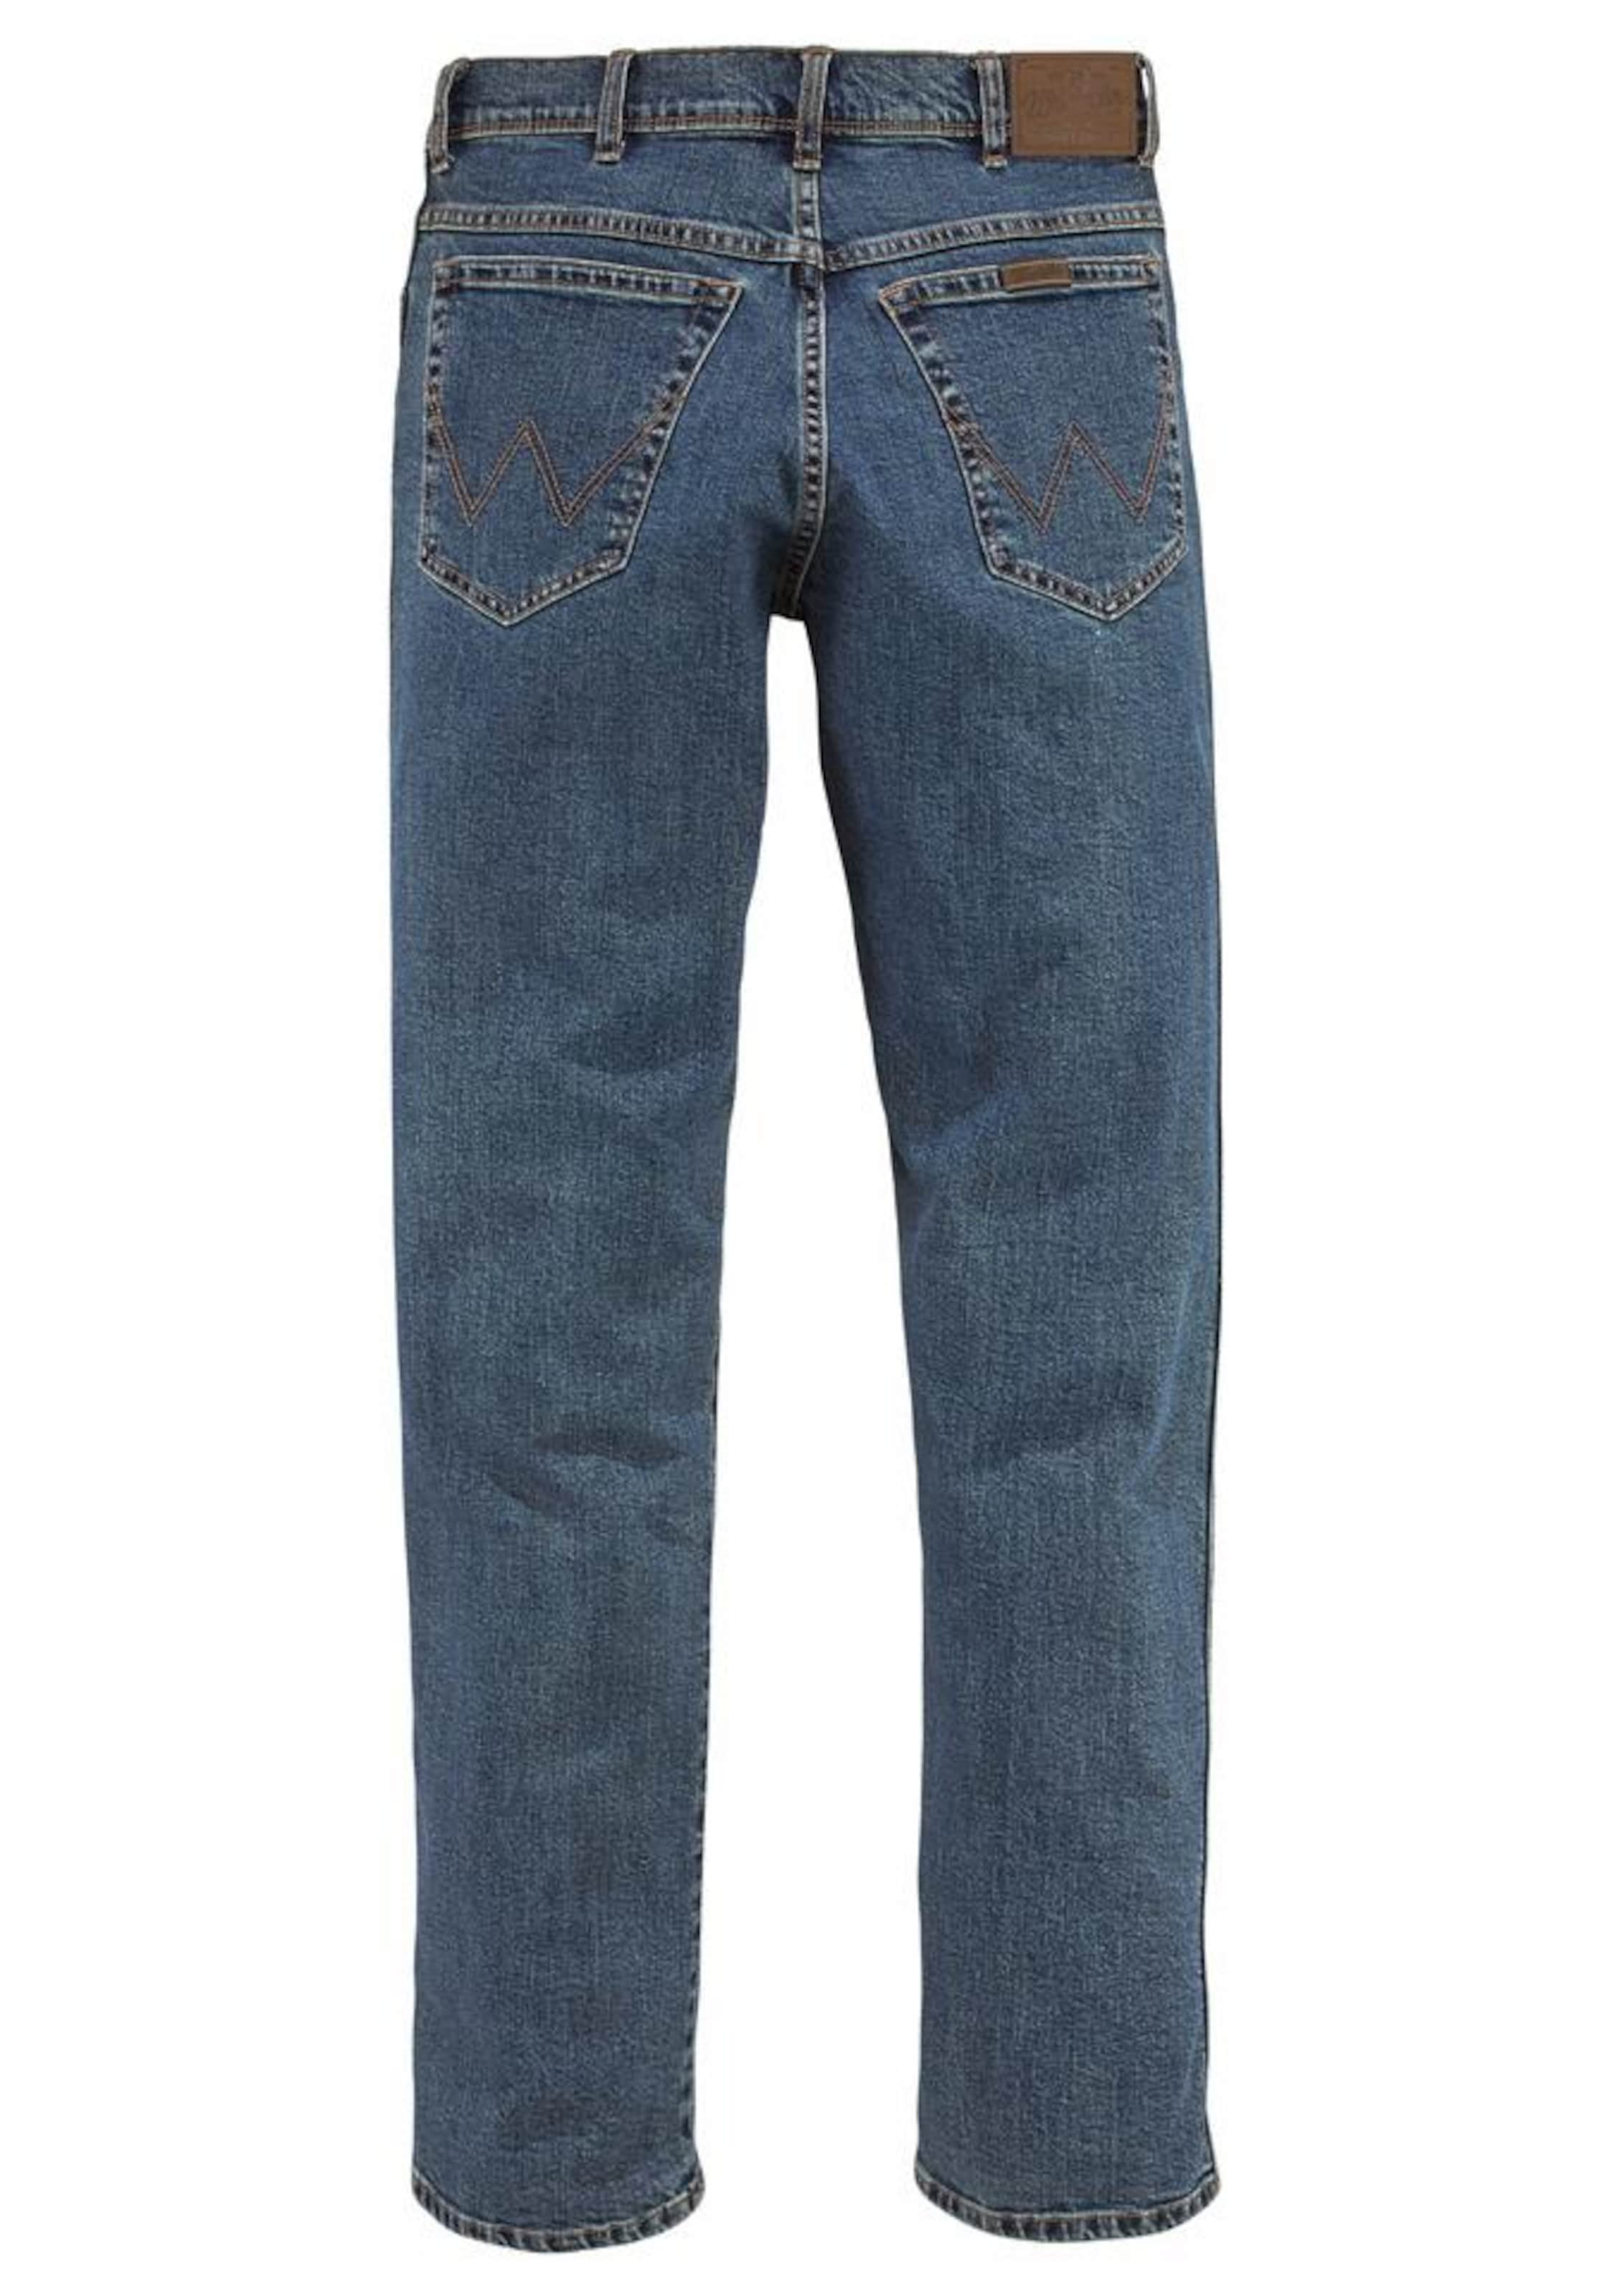 Denim jeans 'durable' Stretch Wrangler In Blue rdxeBoC